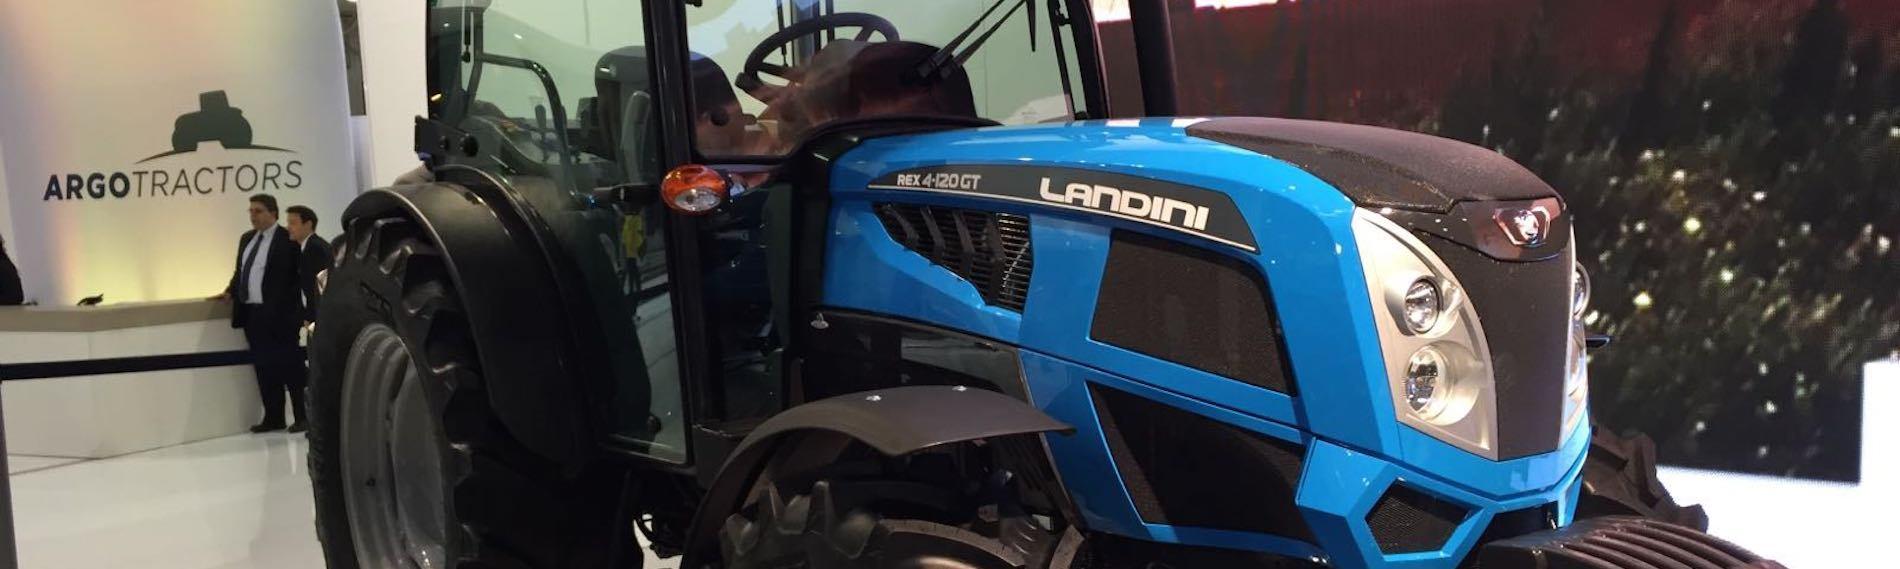 trattore-landini-rex-4